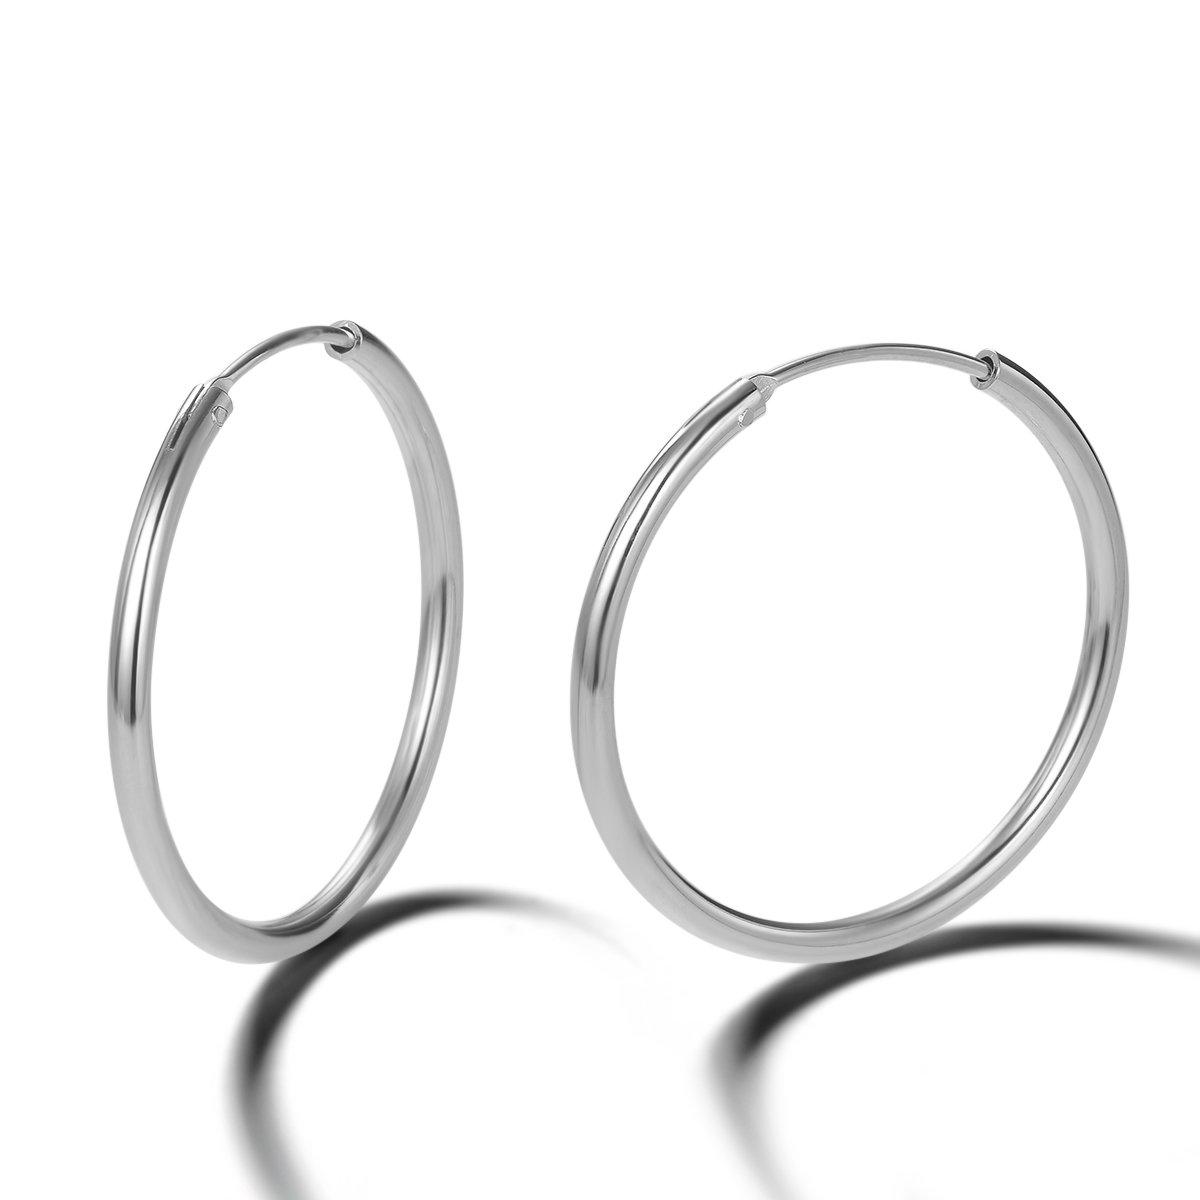 Carleen 14K White Gold Plated 925 Sterling Silver Dainty Endless Hoop Earrings for Women Girls (30mm)